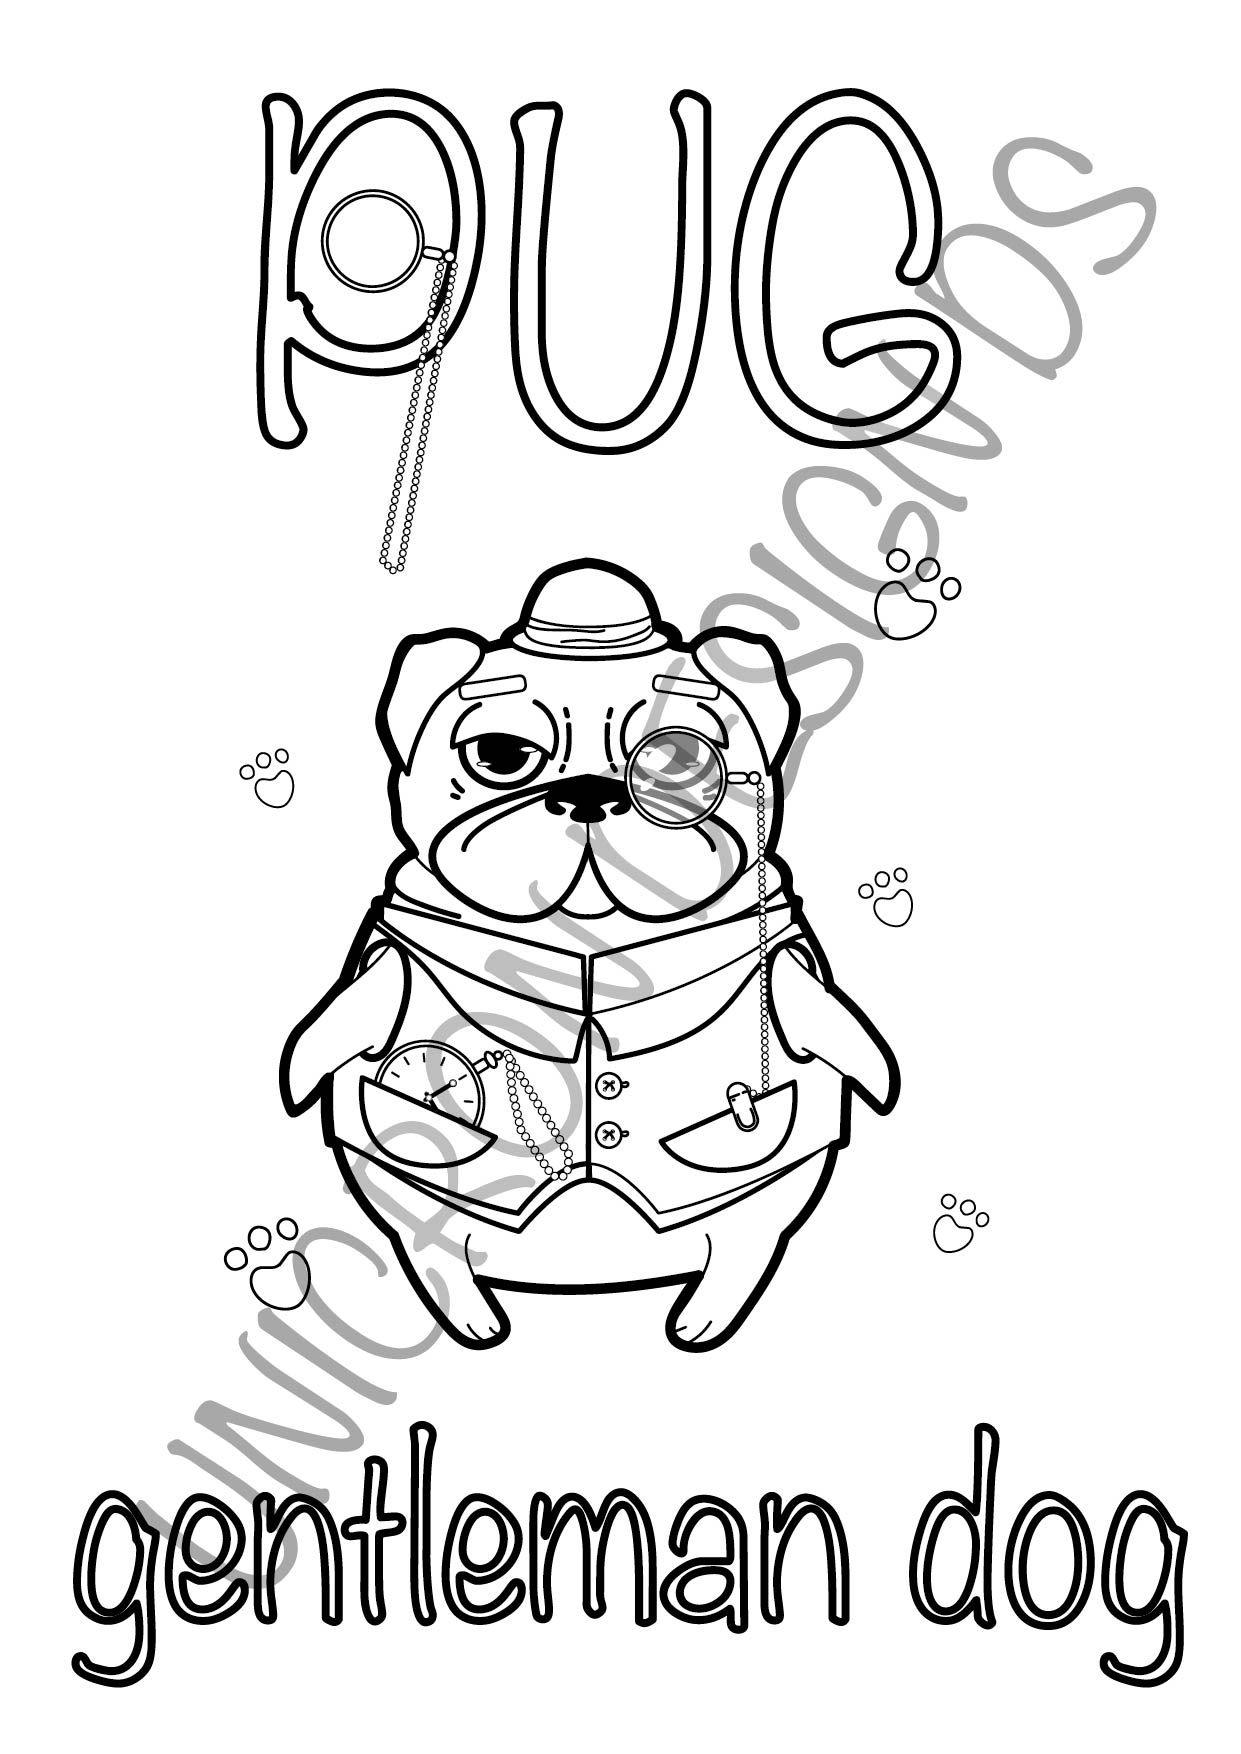 Printable Cute Pug Dog Animals Illustration Coloring Pages For Etsy Coloring Pages Coloring Pages For Kids Animal Illustration